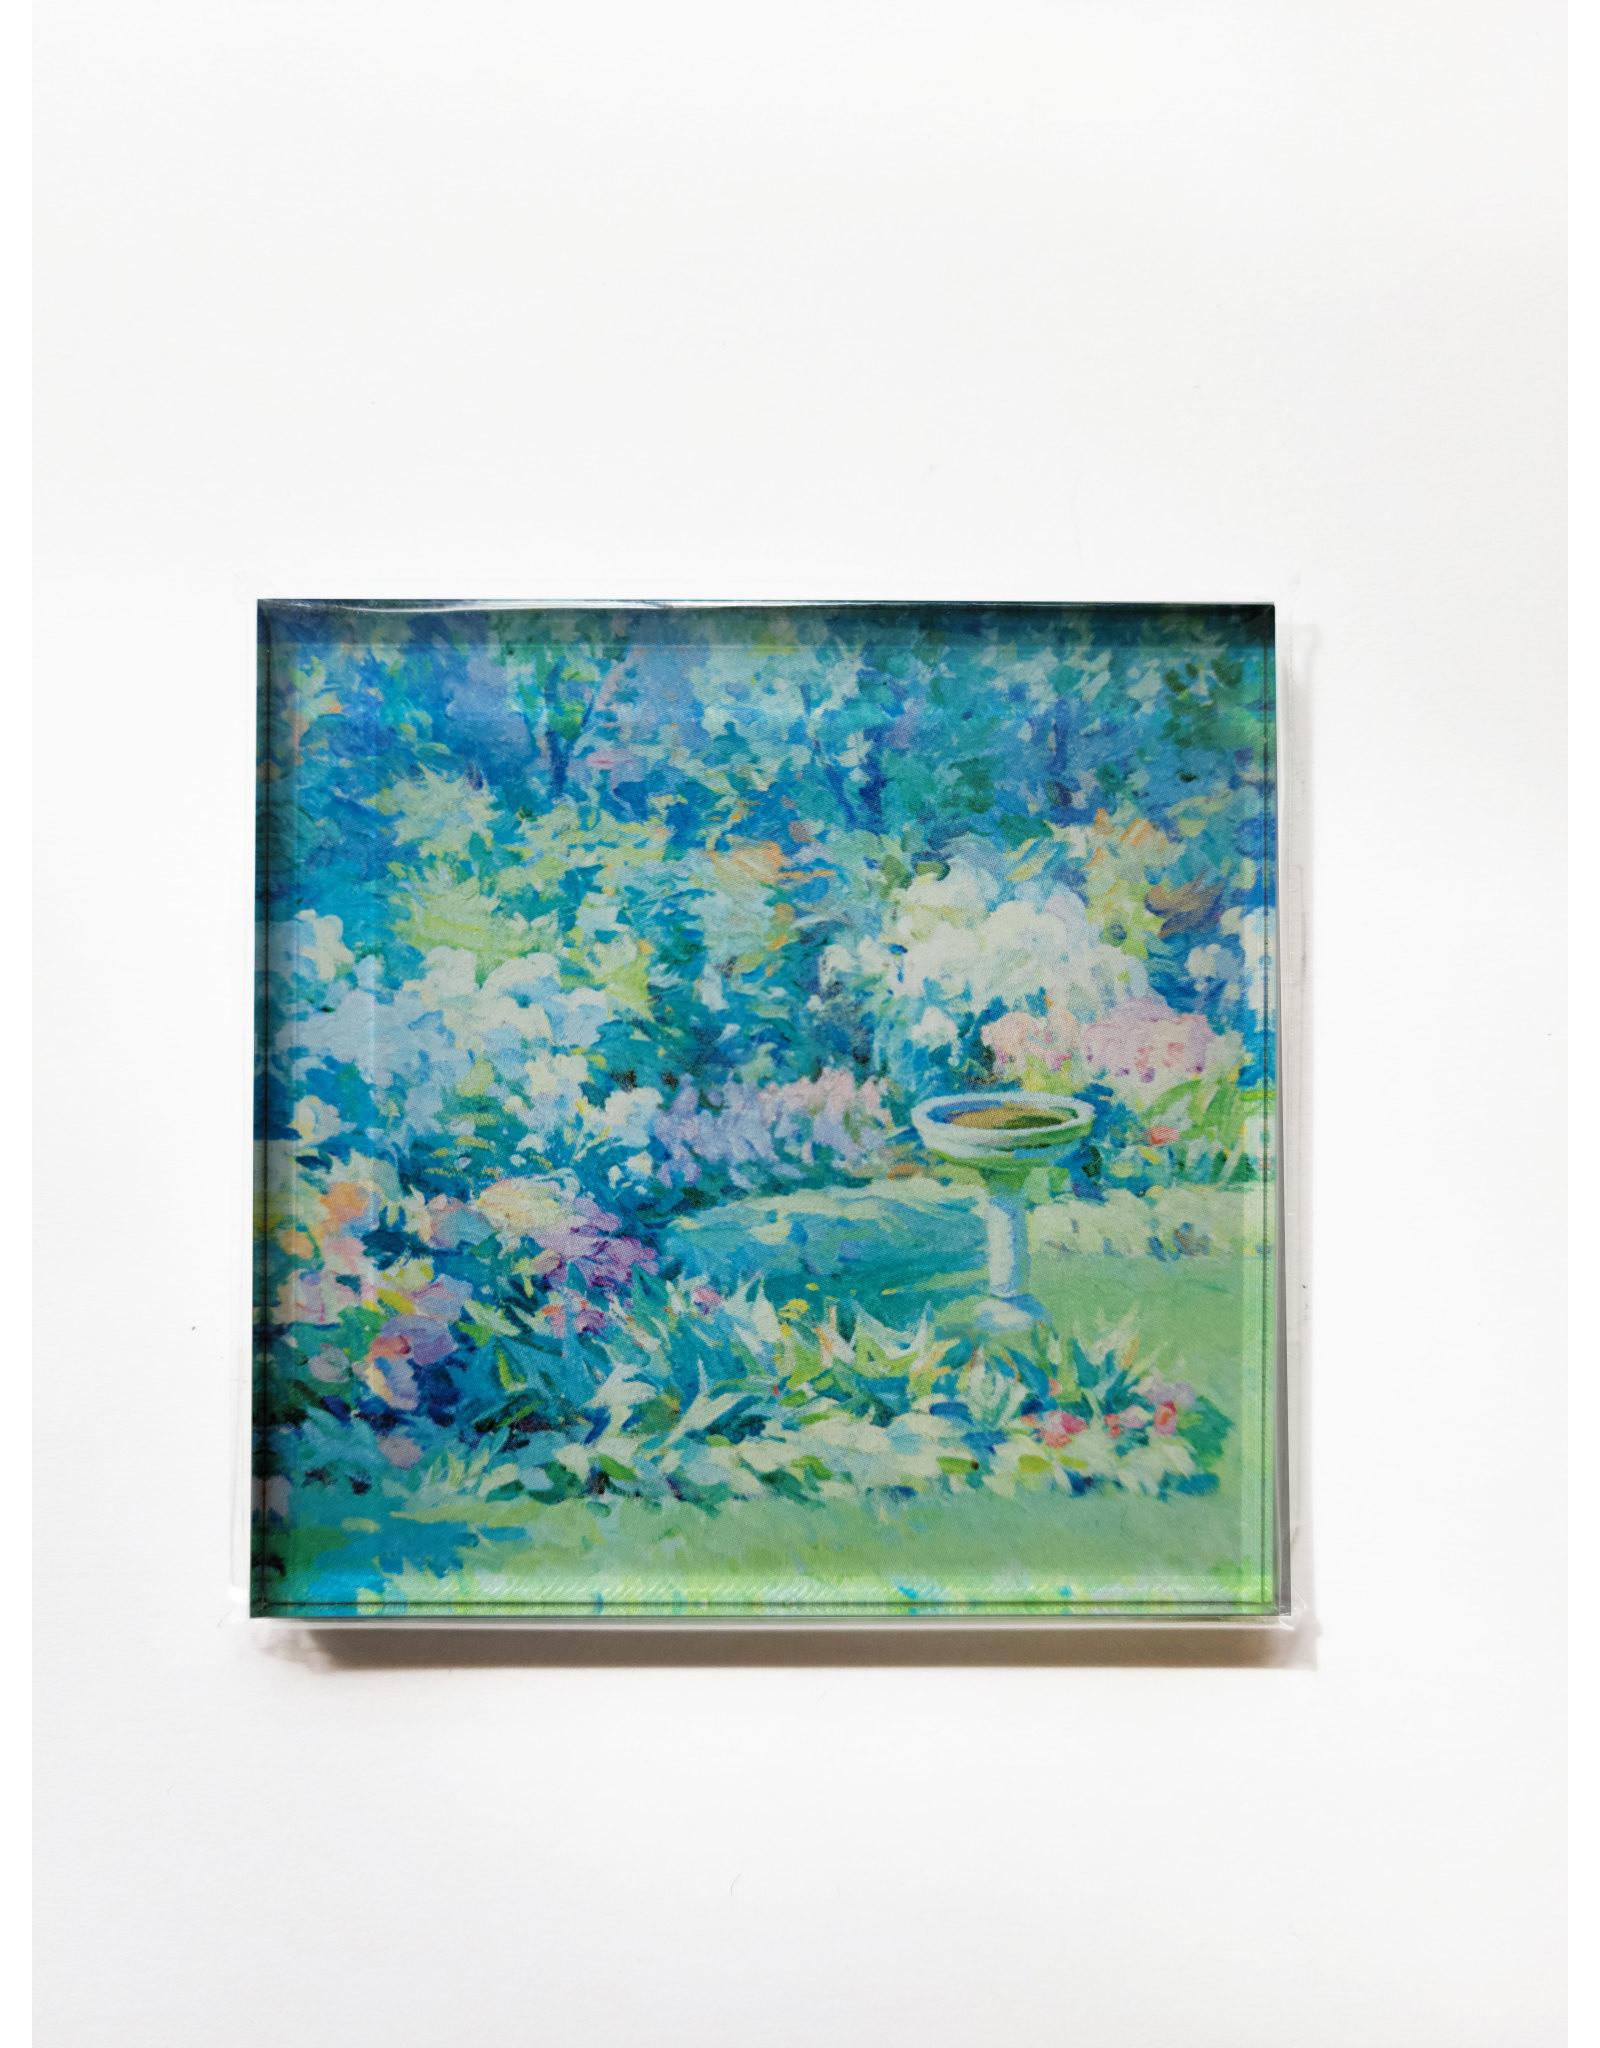 Impressionism Magnet - Woodward